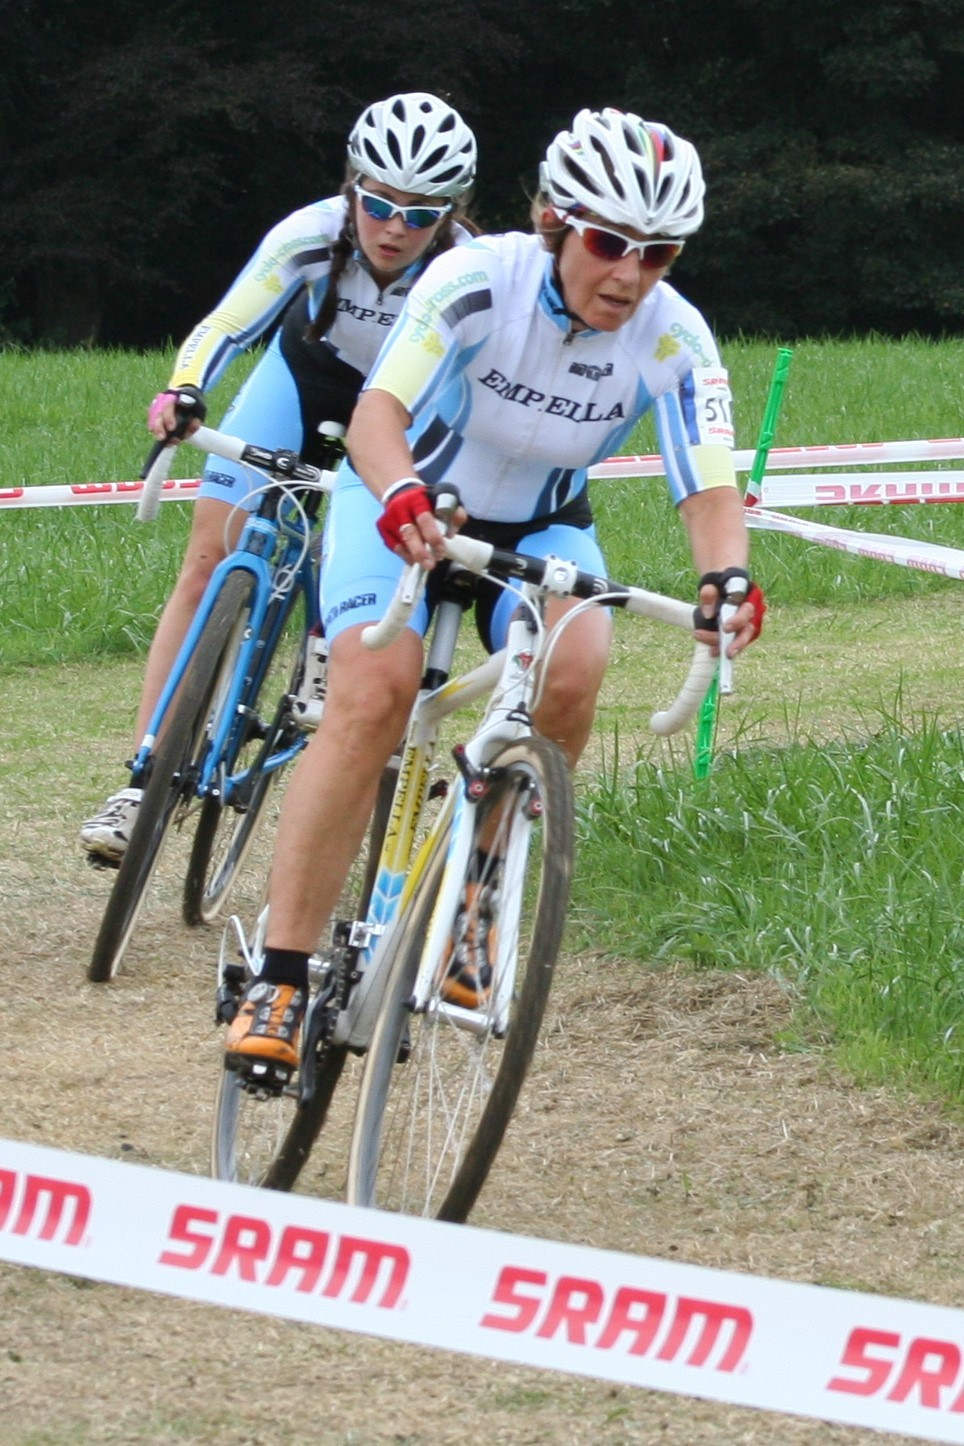 Tracey Fletcher, Tiffany Fletcher, Empella, NDCXL, cyclo-cross